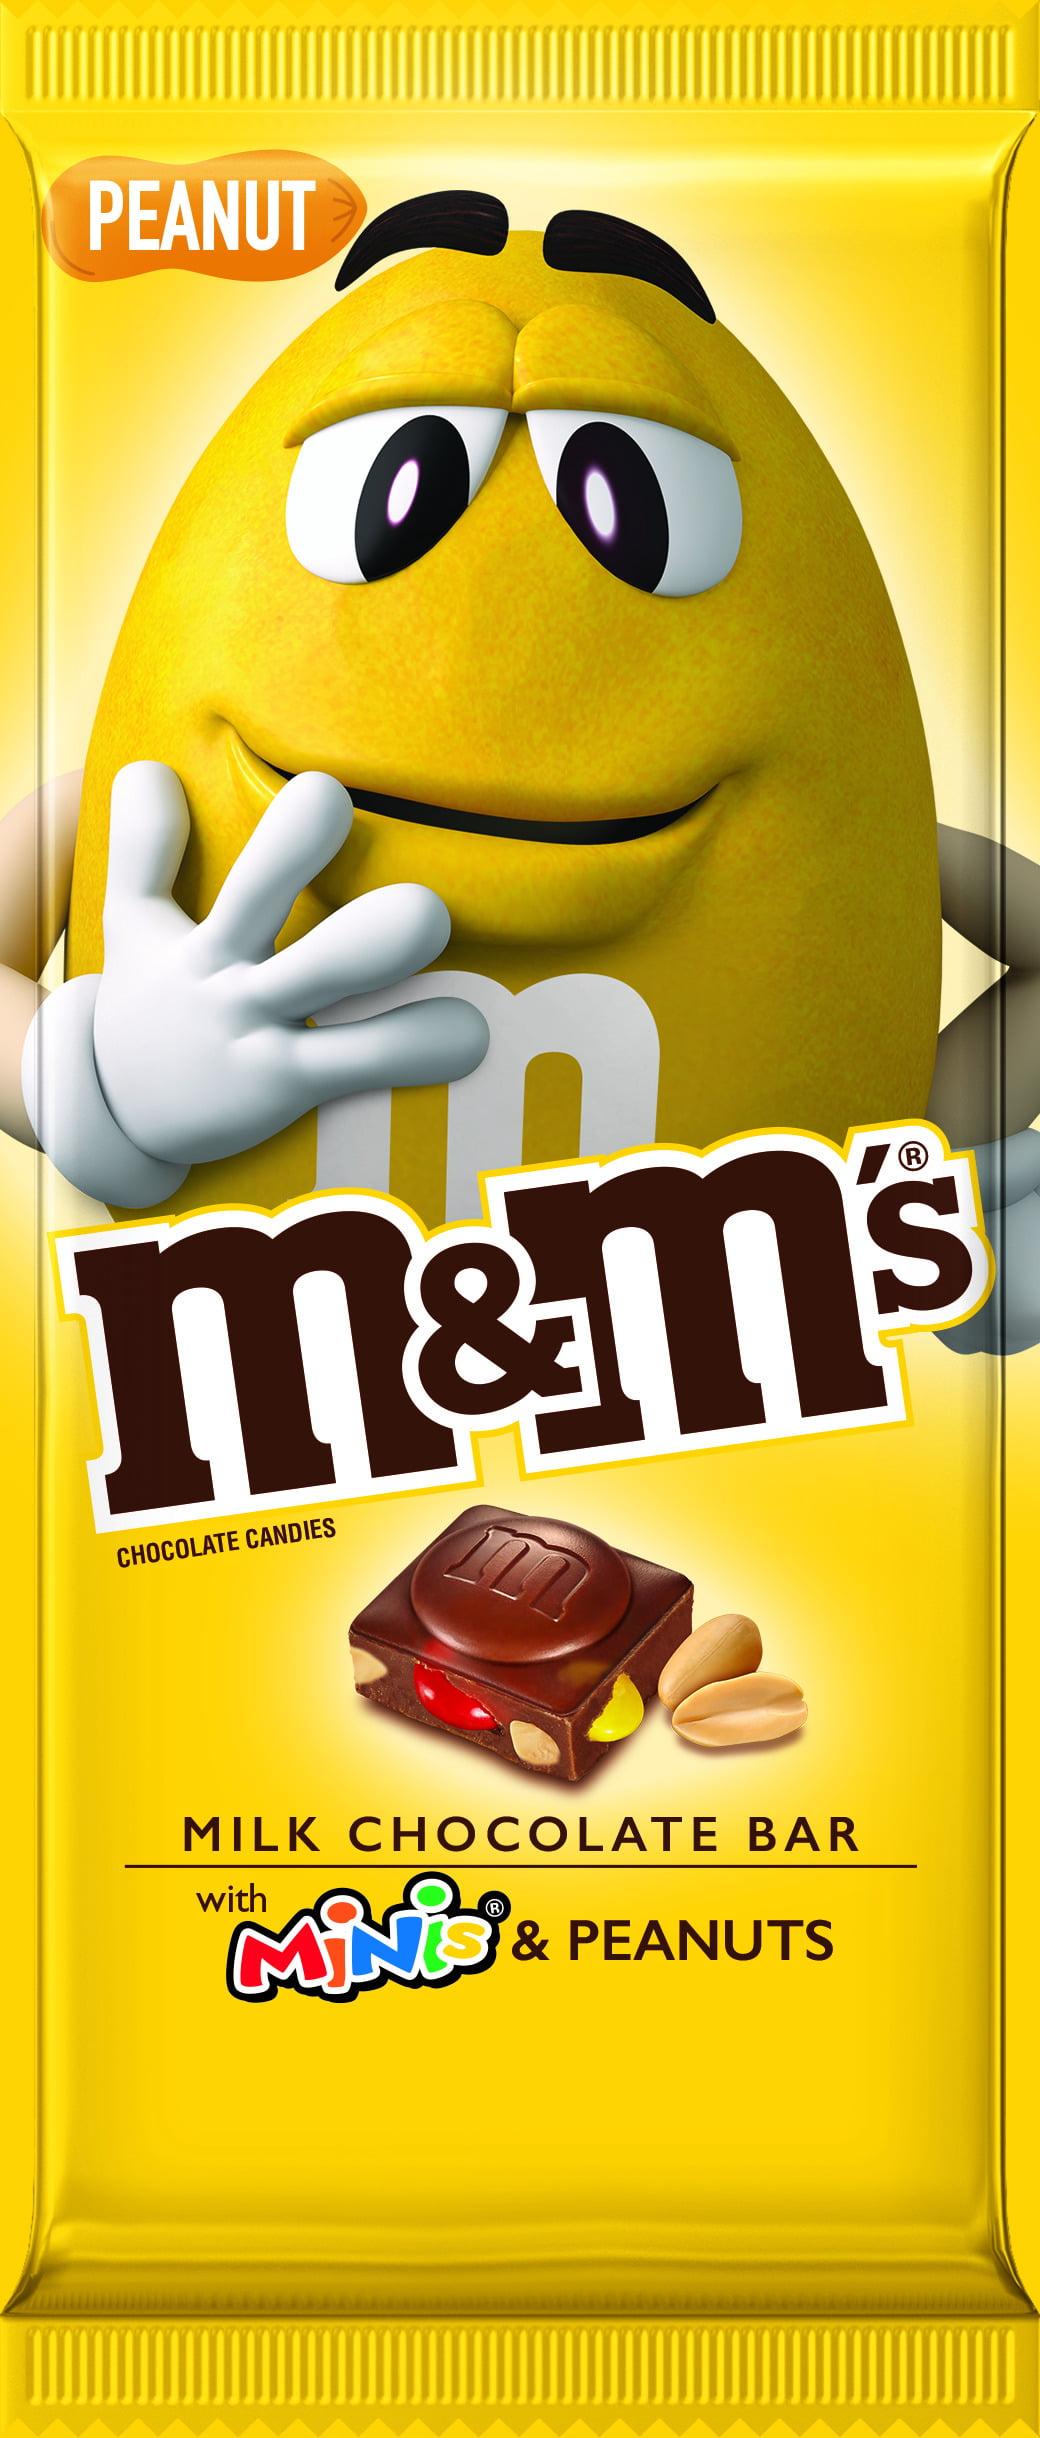 M&M'S Peanut & Minis Milk Chocolate Candy Bar - 4oz